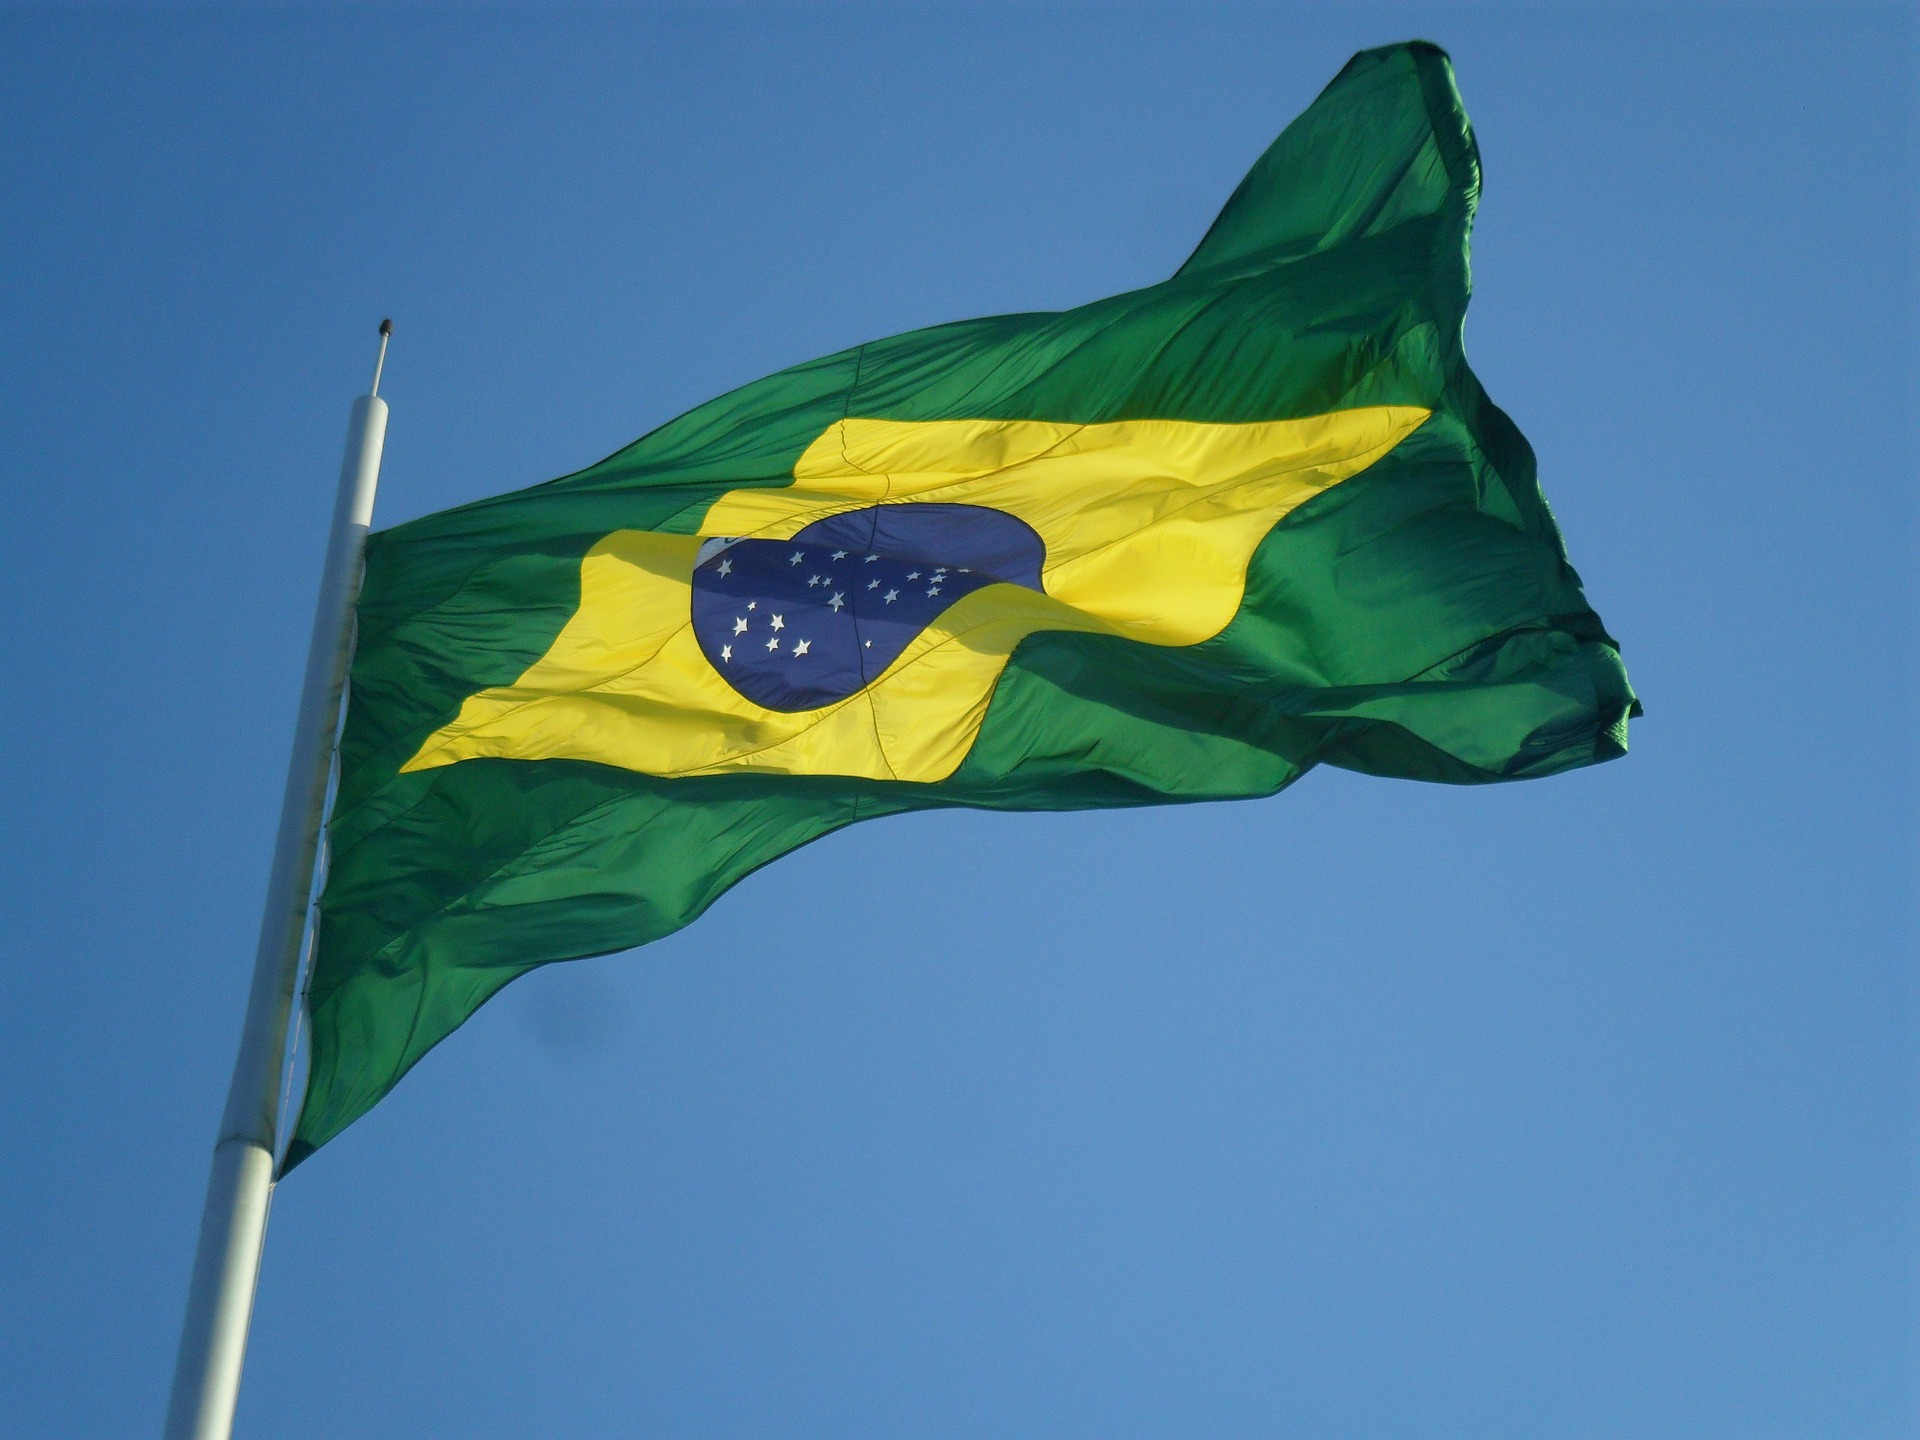 FMI crítica ineficácia da gestão governamental Brasileira